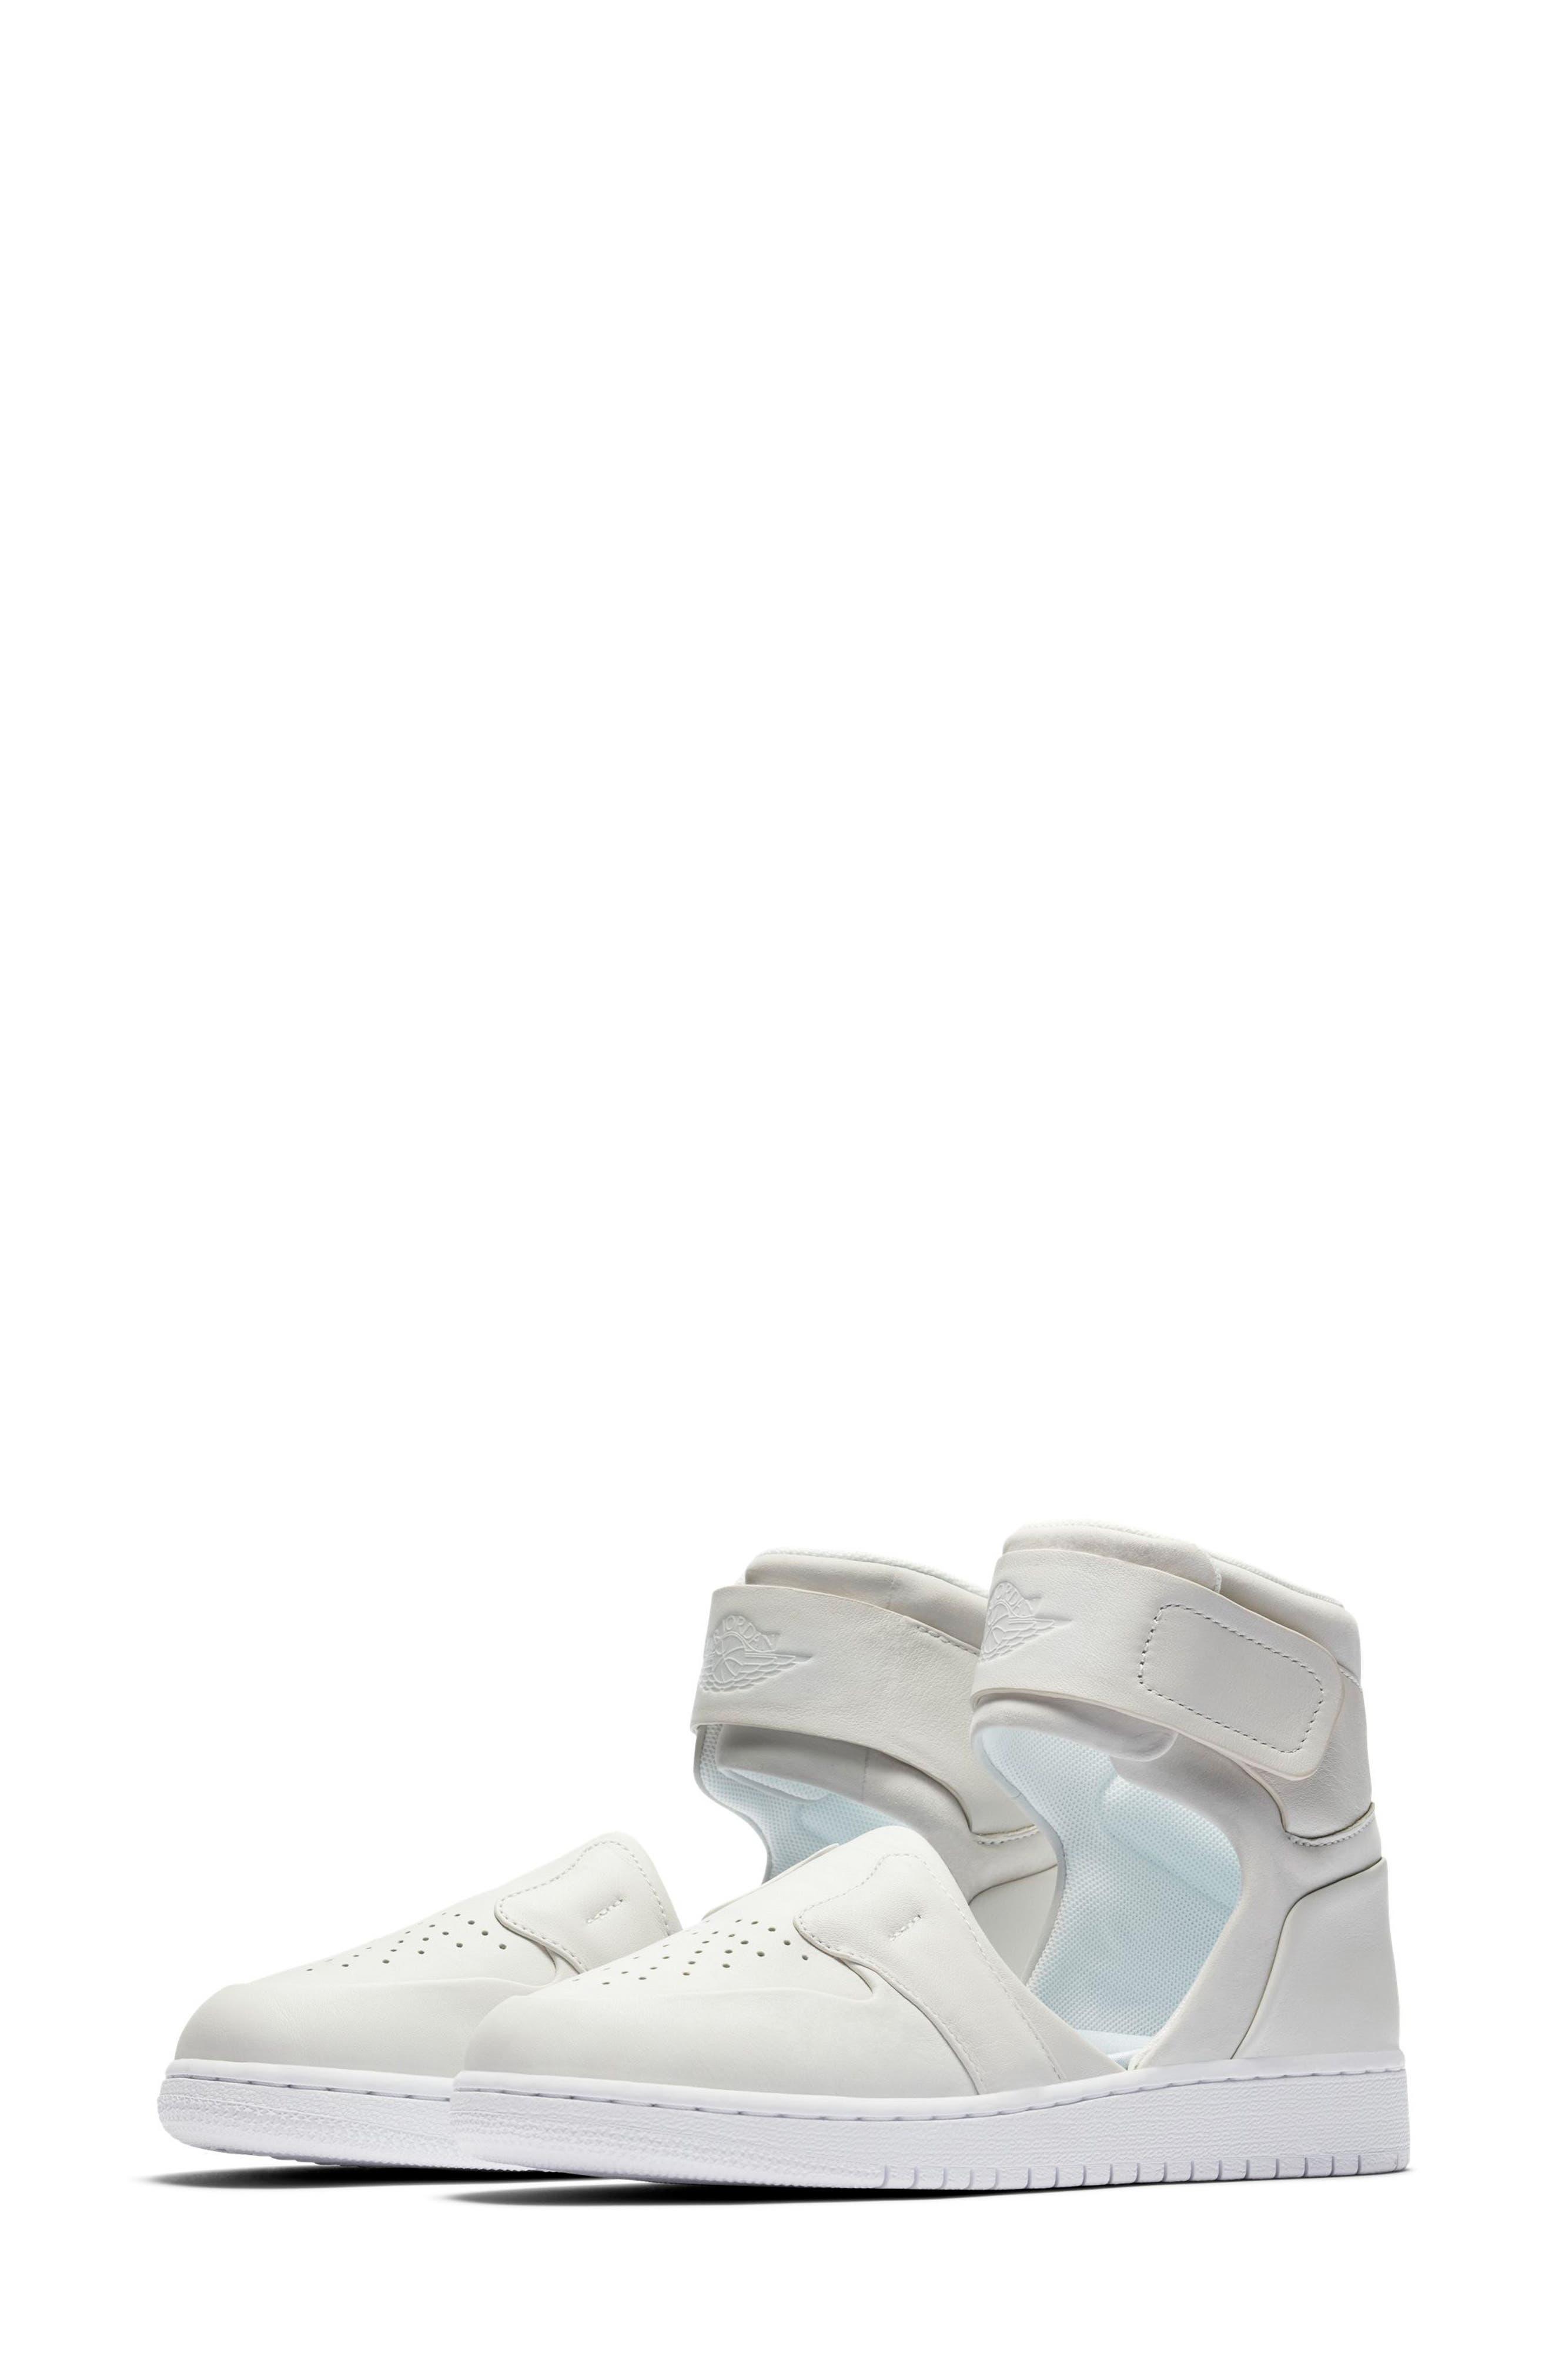 Nike Air Jordan 1 Lover XX Ankle Strap